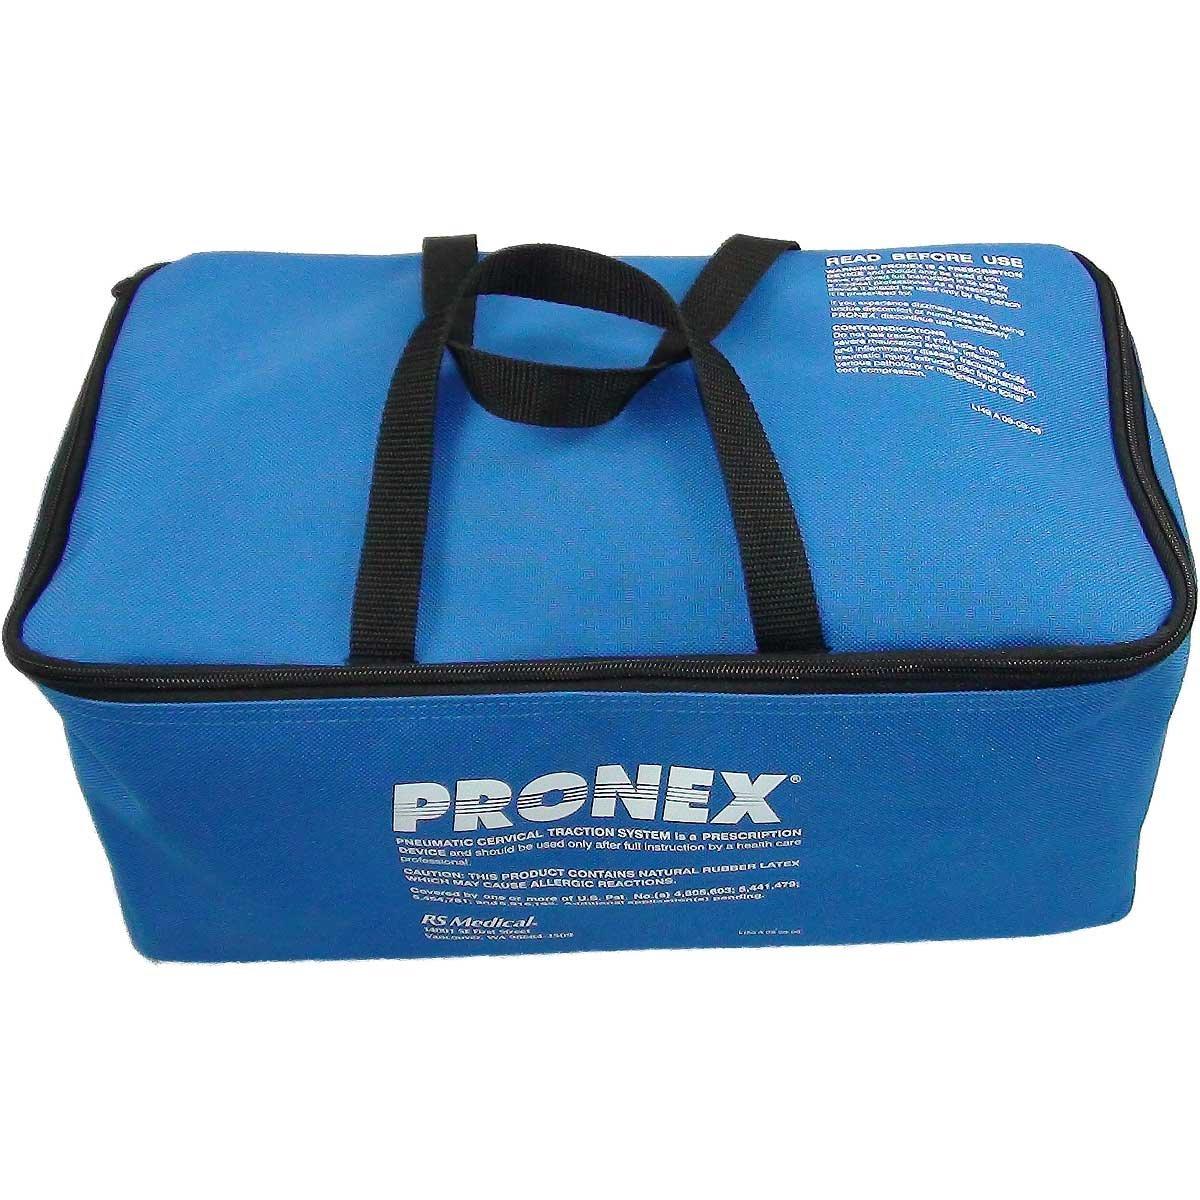 Pronex® Pneumatic Cervical Traction Device (Regular)